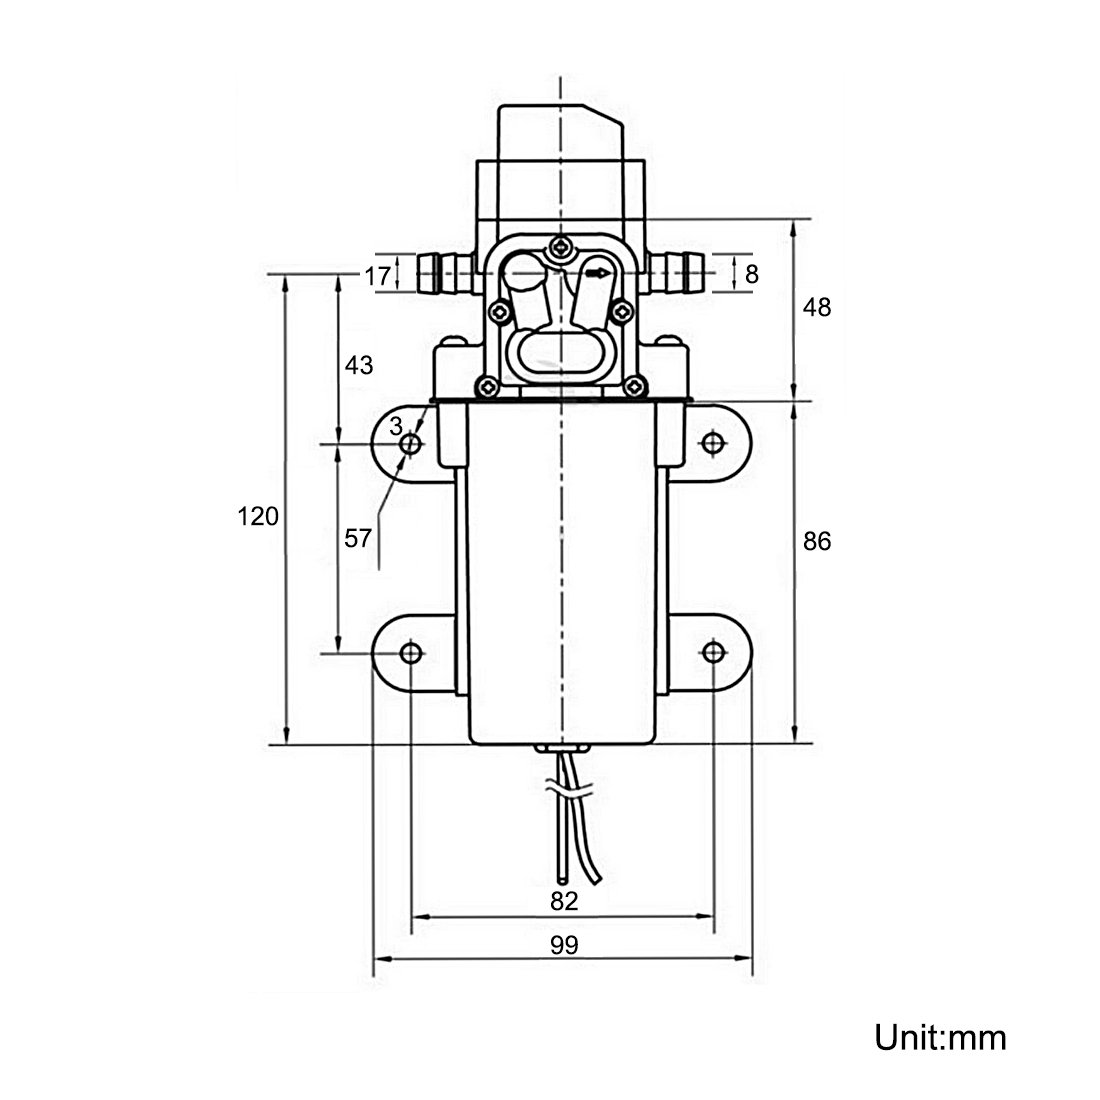 4l Engine Diagram 3 Automotive Wiring Diagrams Pontiac 4 Water Circulation Scematic Lq1 34l